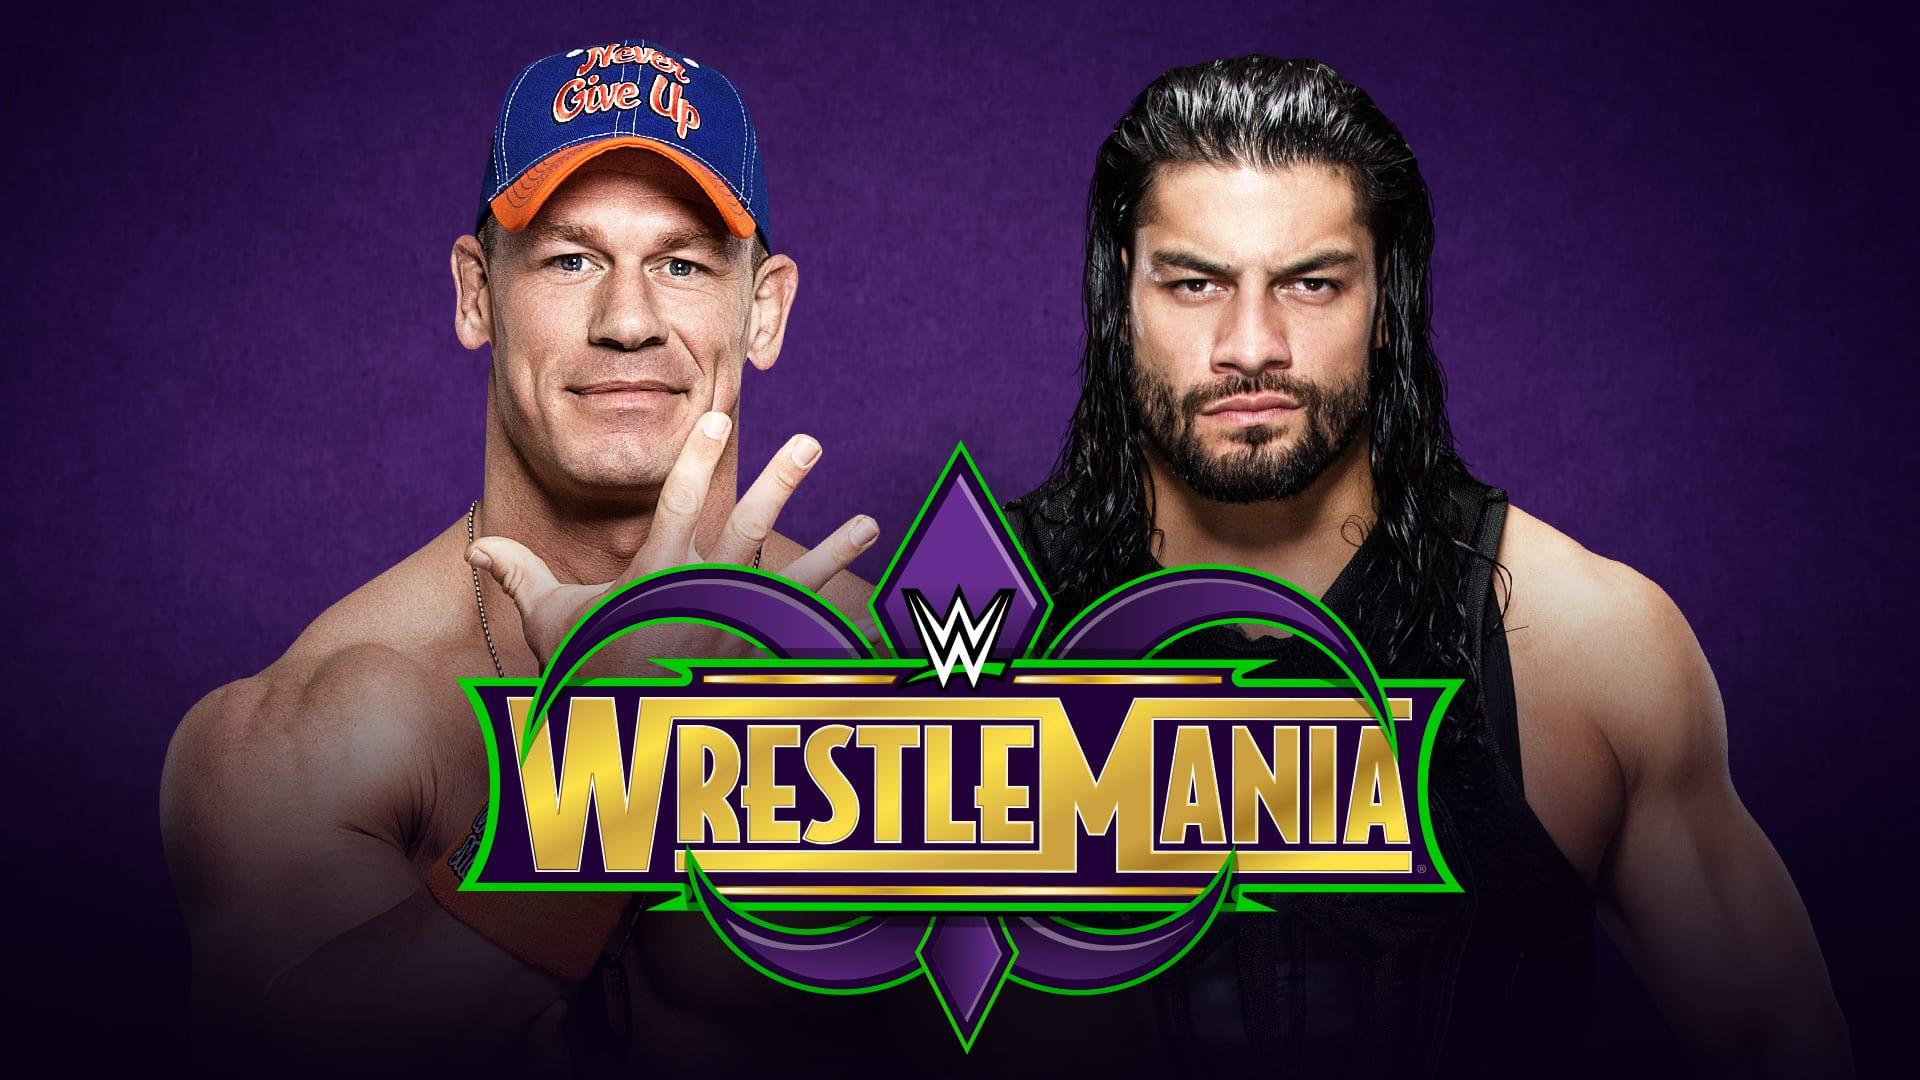 John Cena vs. Roman Reigns - WrestleMania